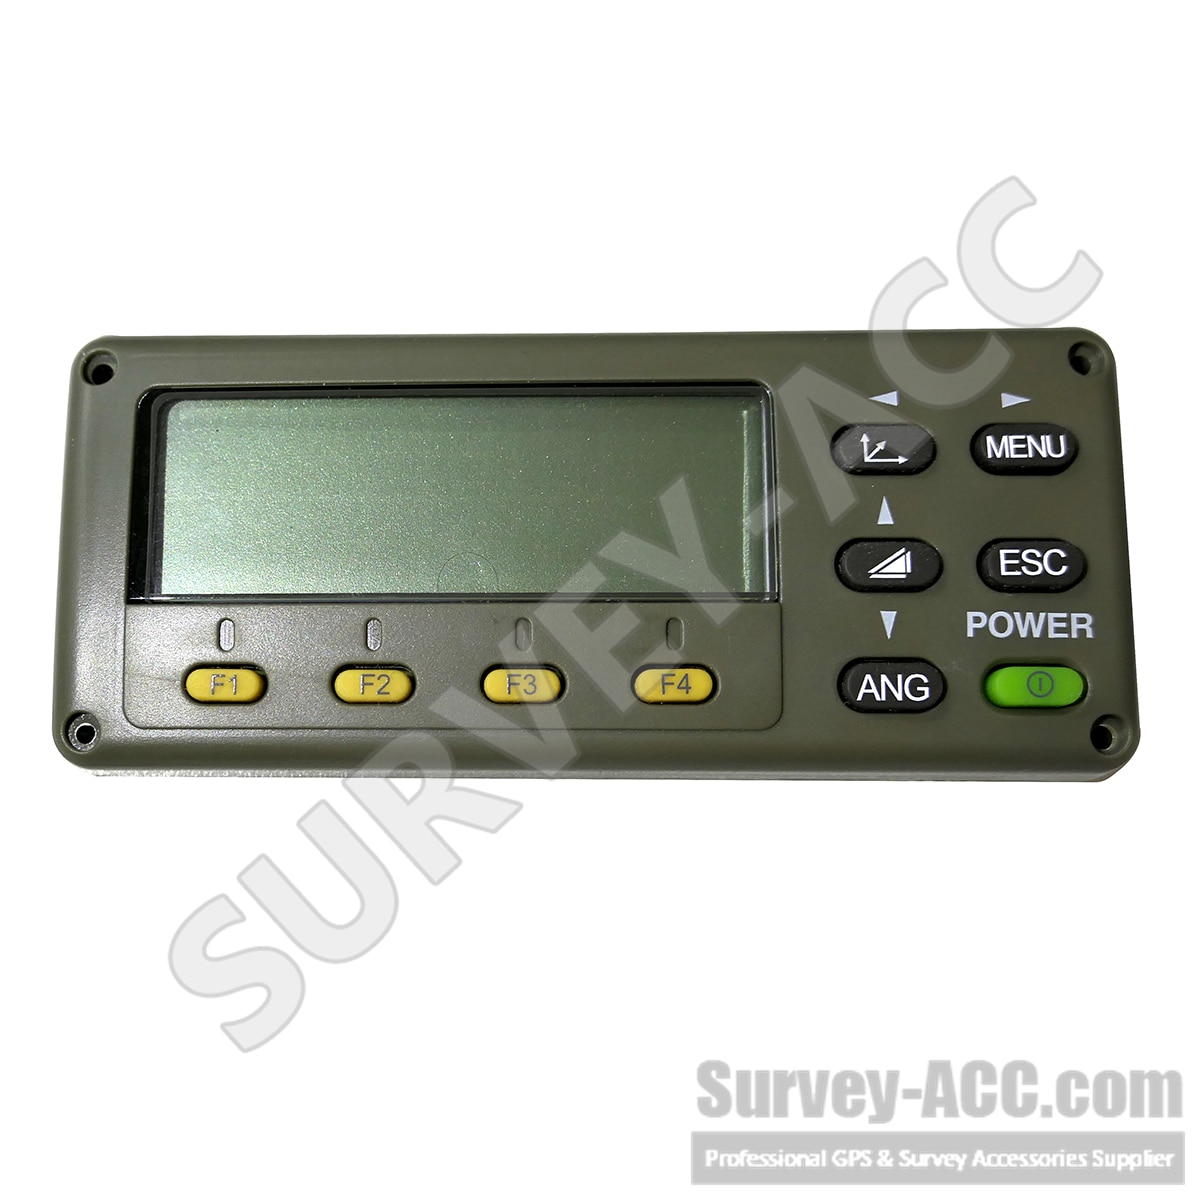 Teclado com Display Topcon Total Staion Series Teclado Gts-220 Lcd